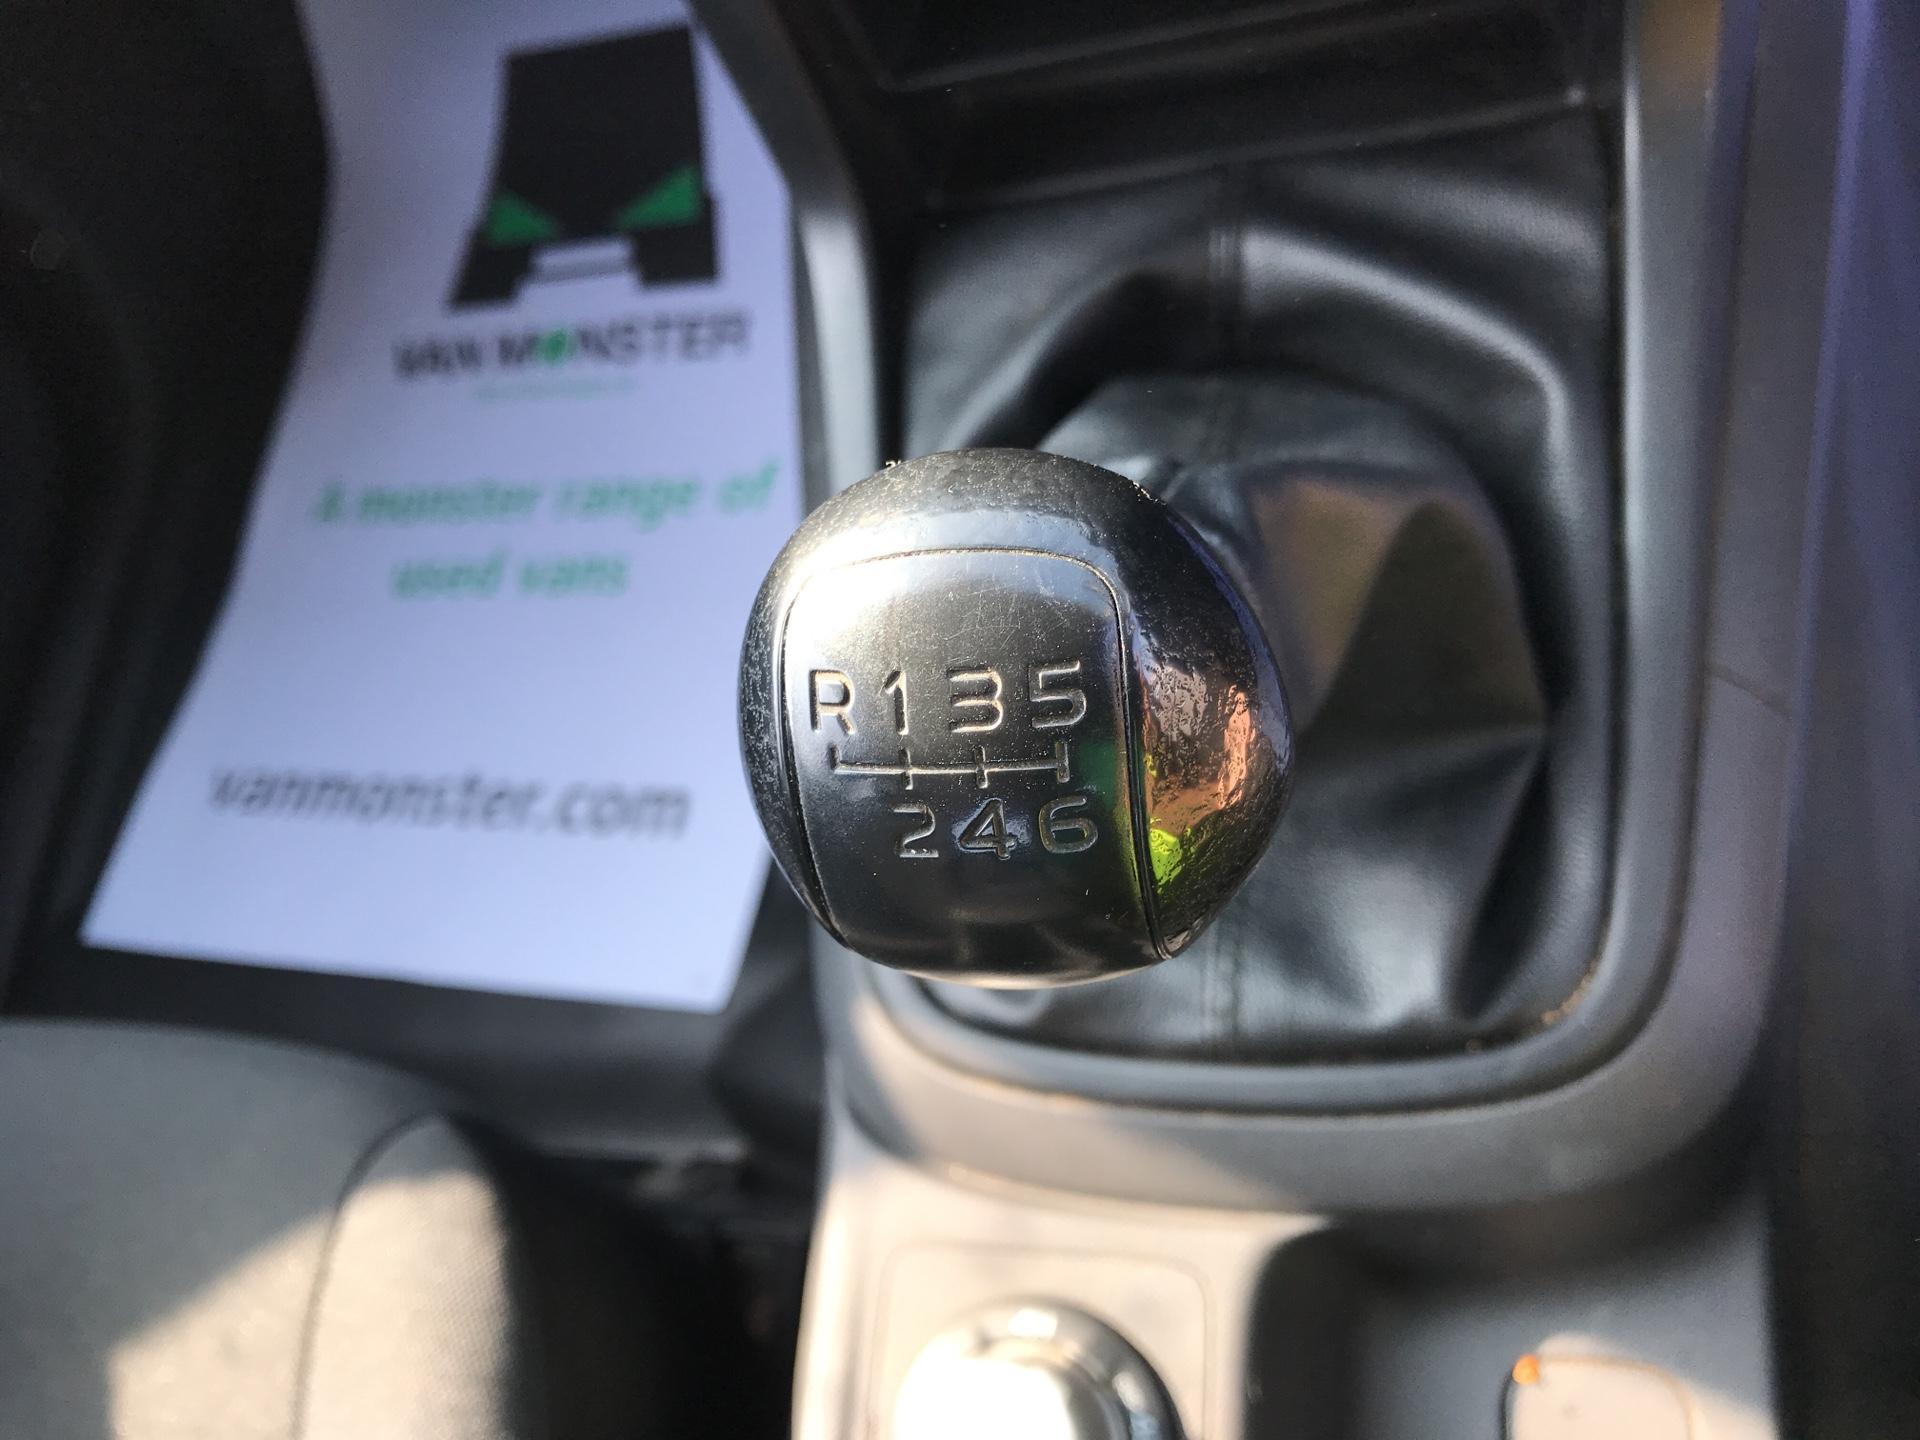 2016 Isuzu D-Max  Double Cab 4 x 4 2.5 TD Euro 5 (YD16PGF) Image 11